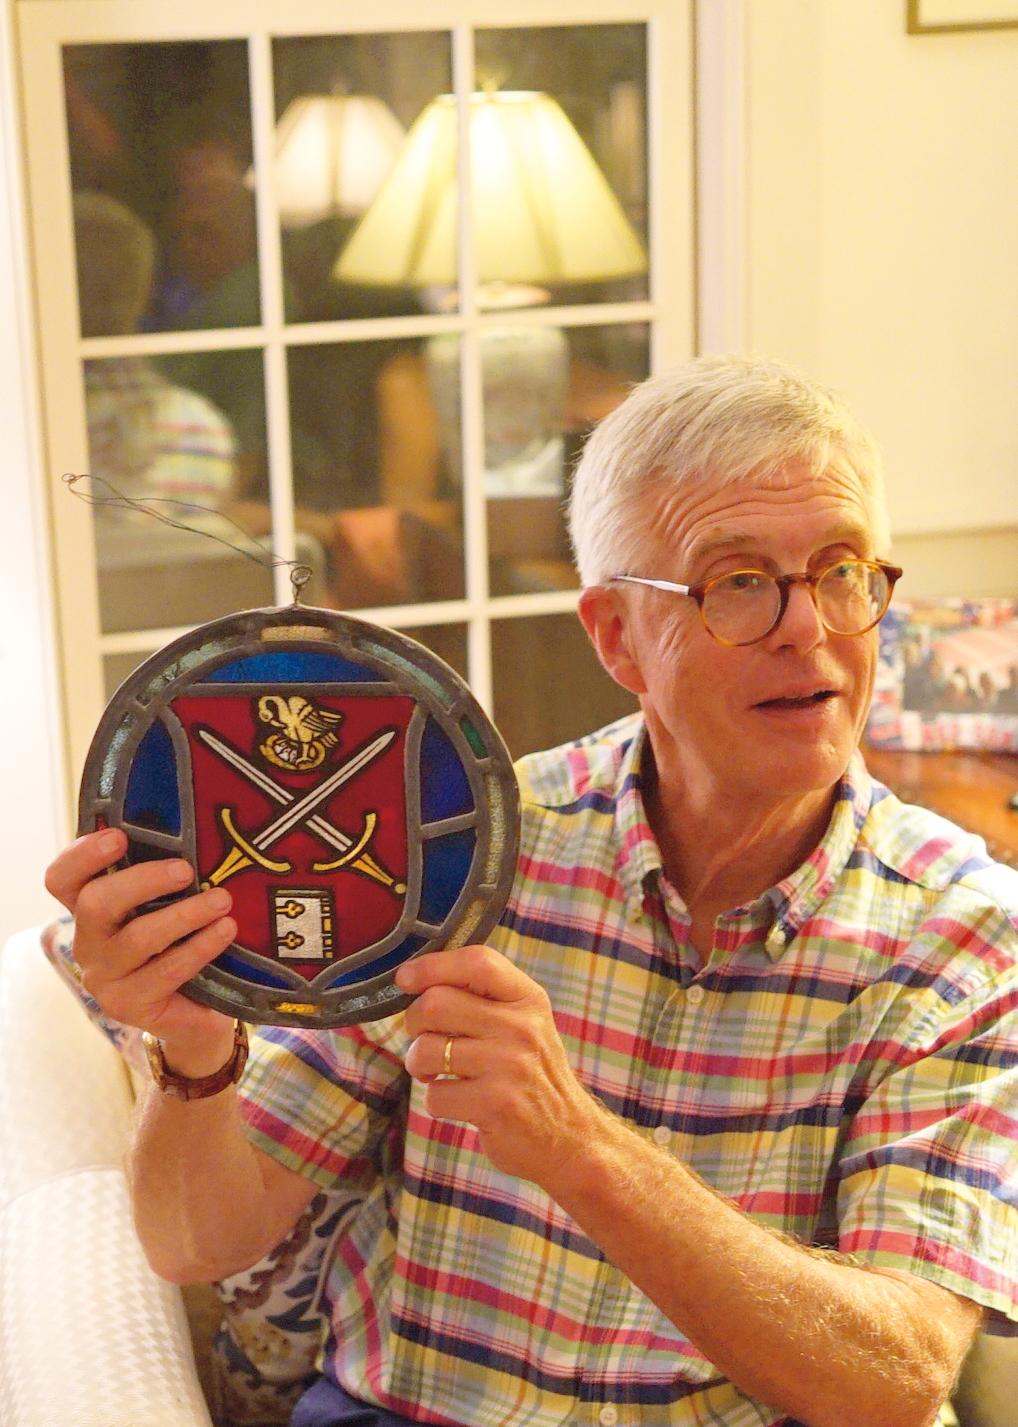 Former Hugh Camp Cup winner John Rice '65 turned 70.